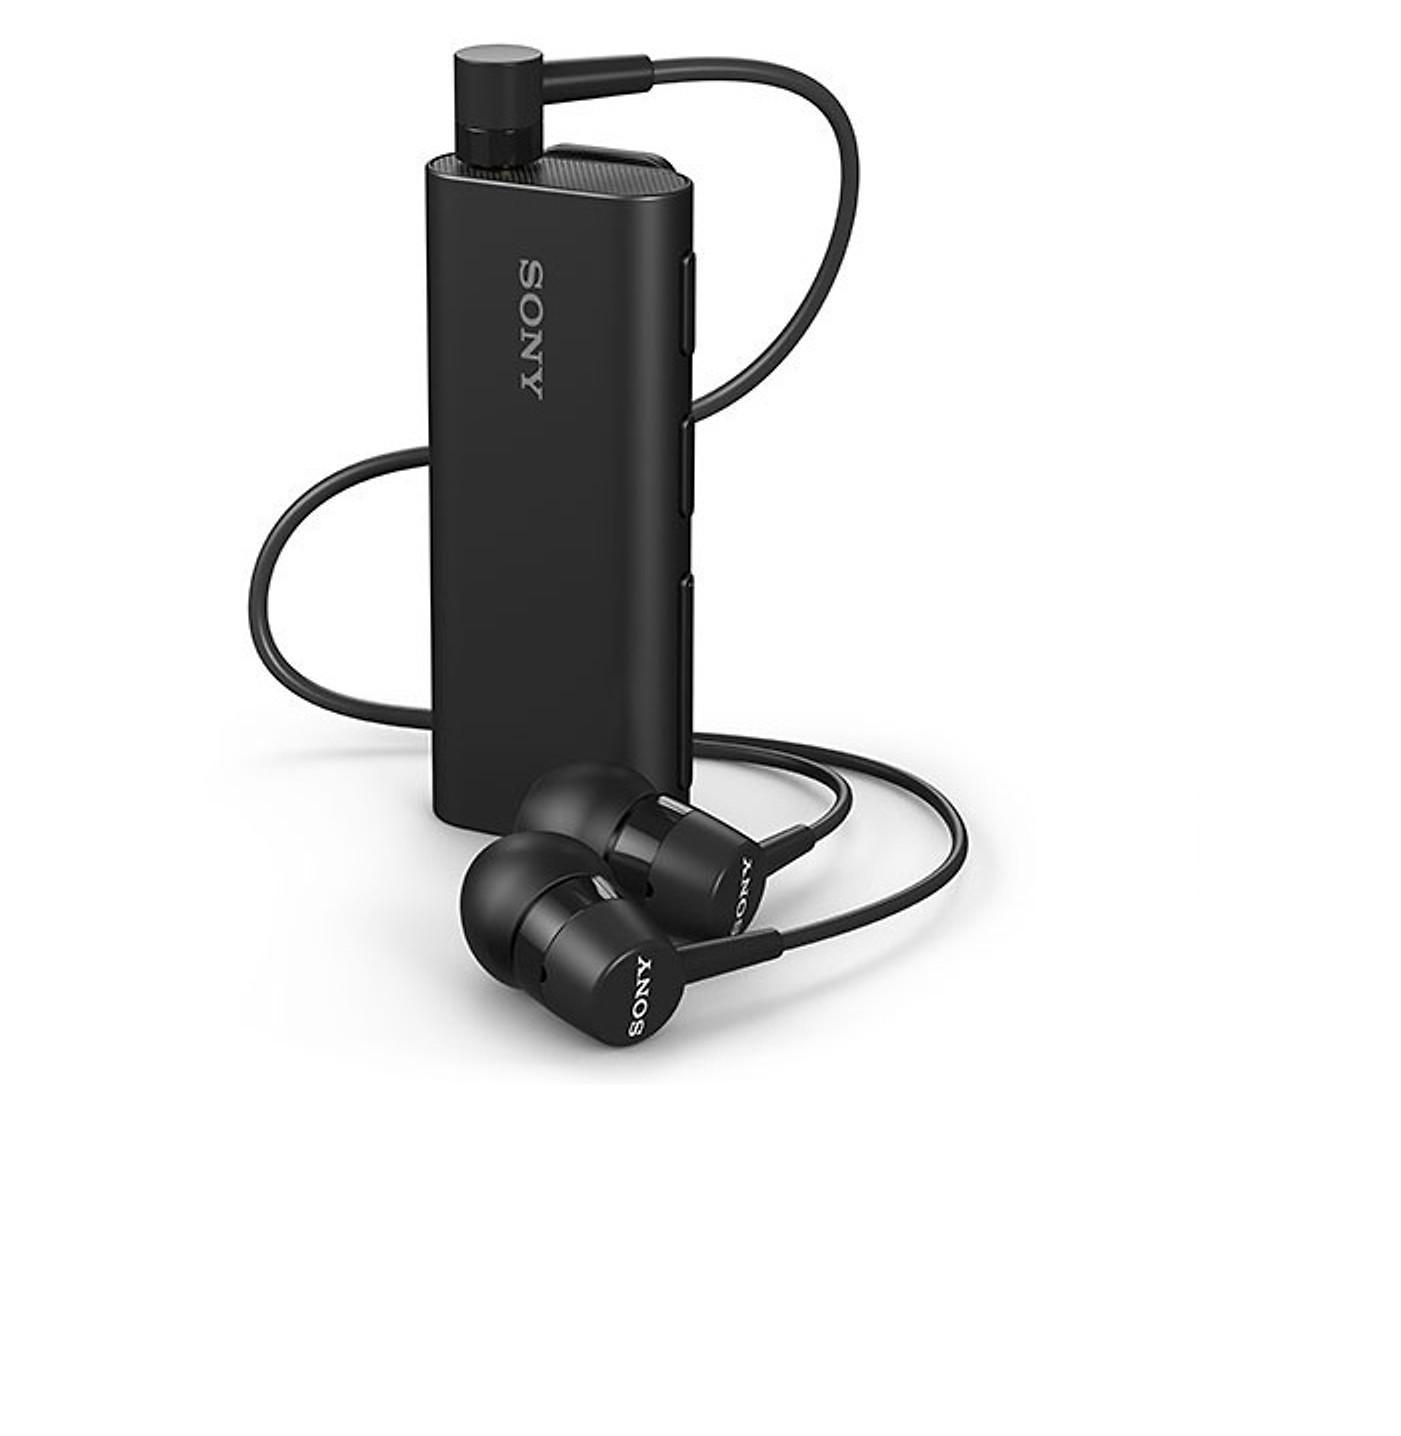 Tai Nghe SONY Bluetooth Stereo SBH56 (Đen)